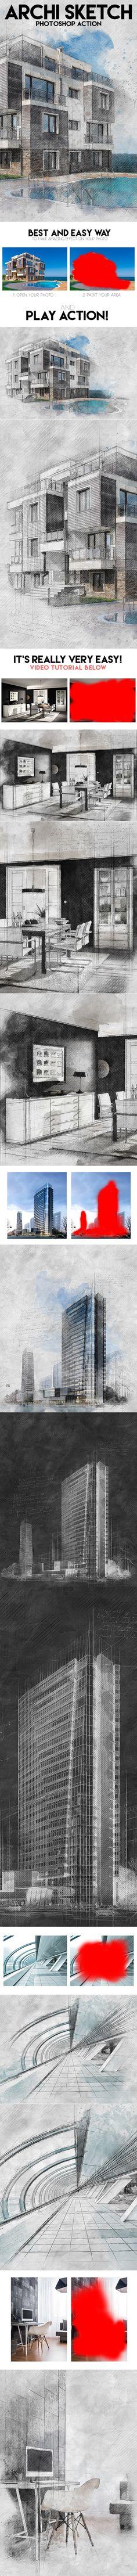 Archi Sketch Photoshop Action. Download here: http://graphicriver.net/item/archi-sketch-photoshop-action/16211716?ref=ksioks